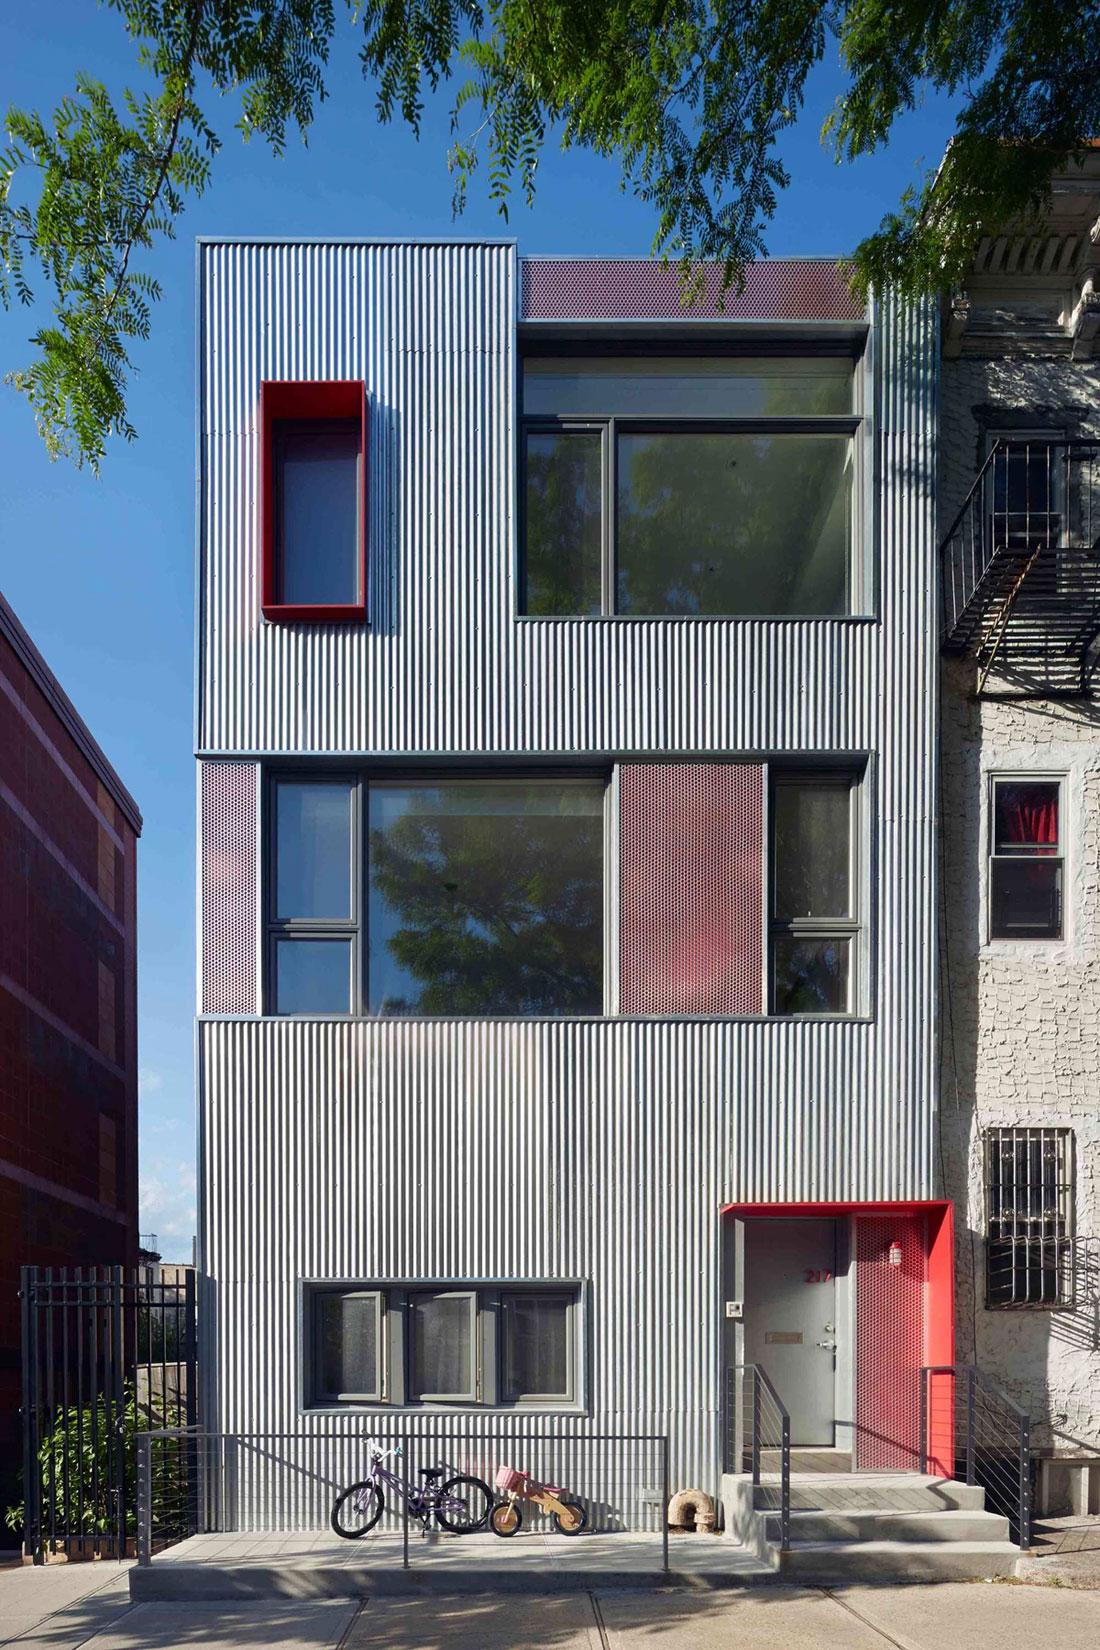 Gutman-Umansky Townhouse by Etelamaki Architecture-02